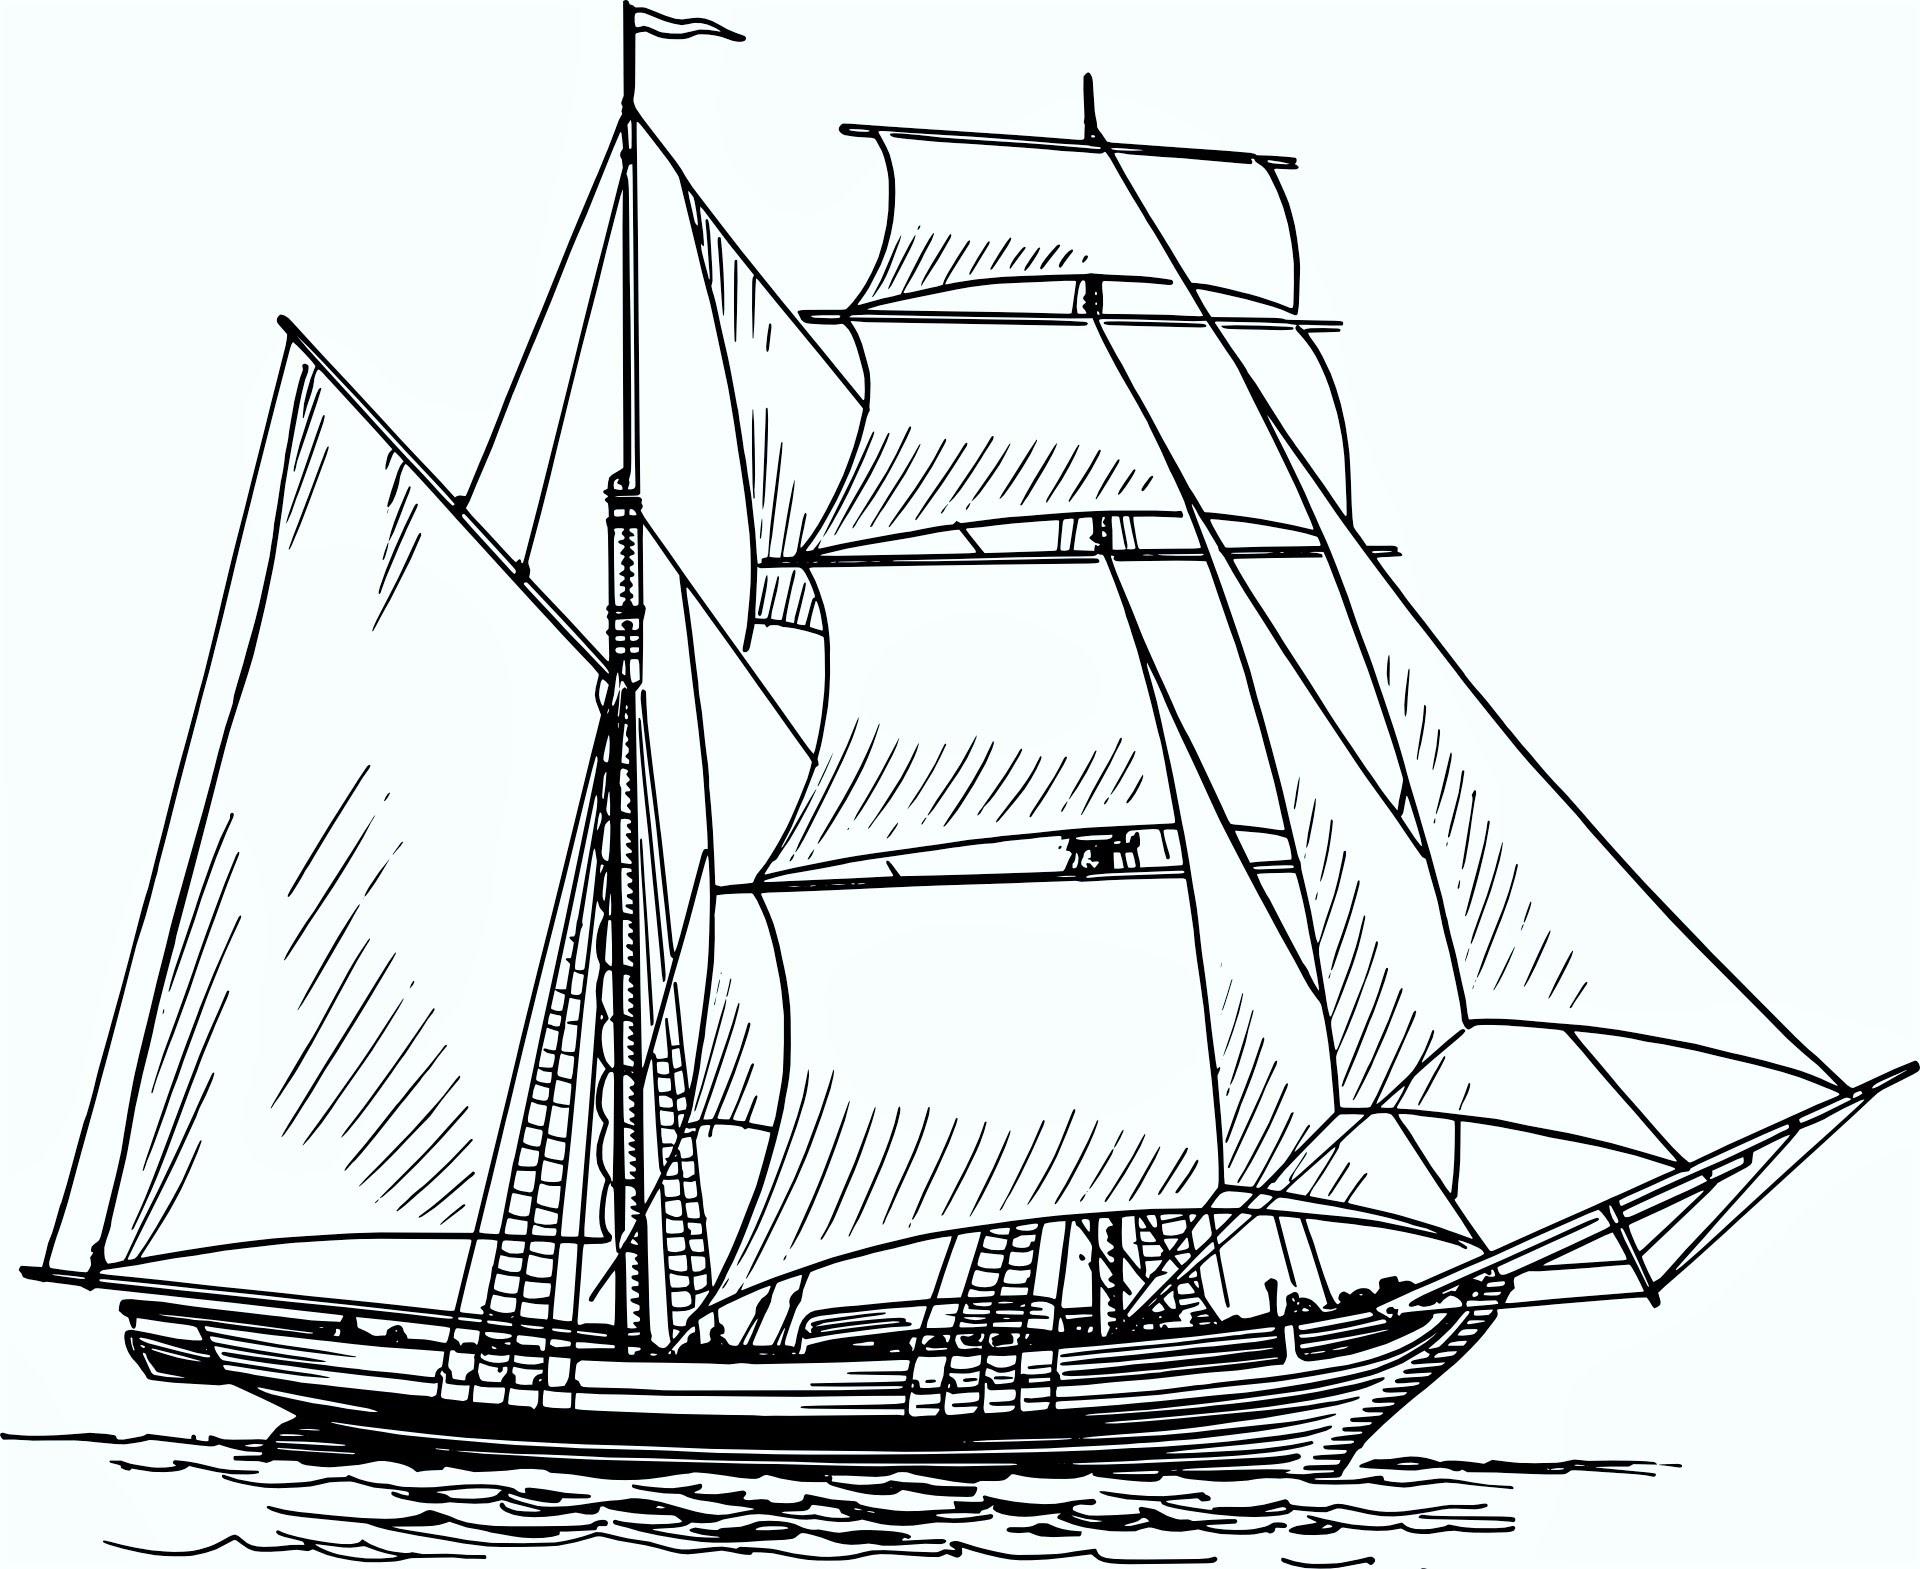 Drawn ship pencil drawing How Drawing boat: the Pencil